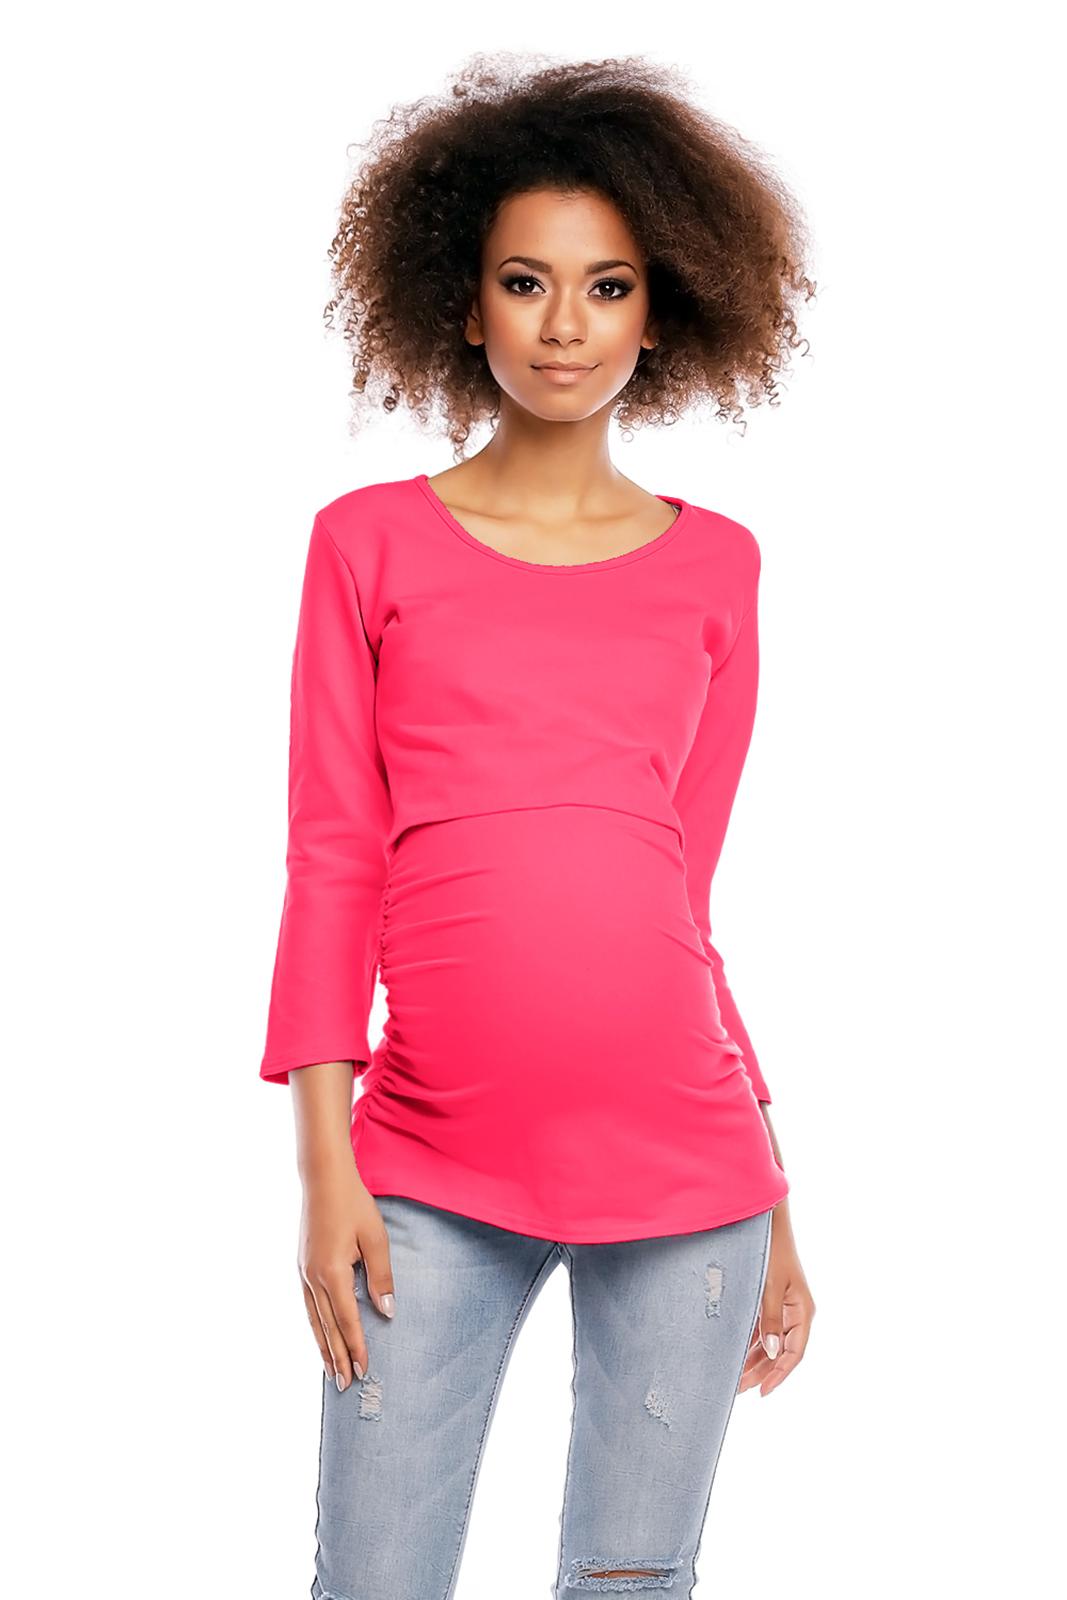 d454863f3da8 Tehotenské tričko mikina aj na dojčenie 1474